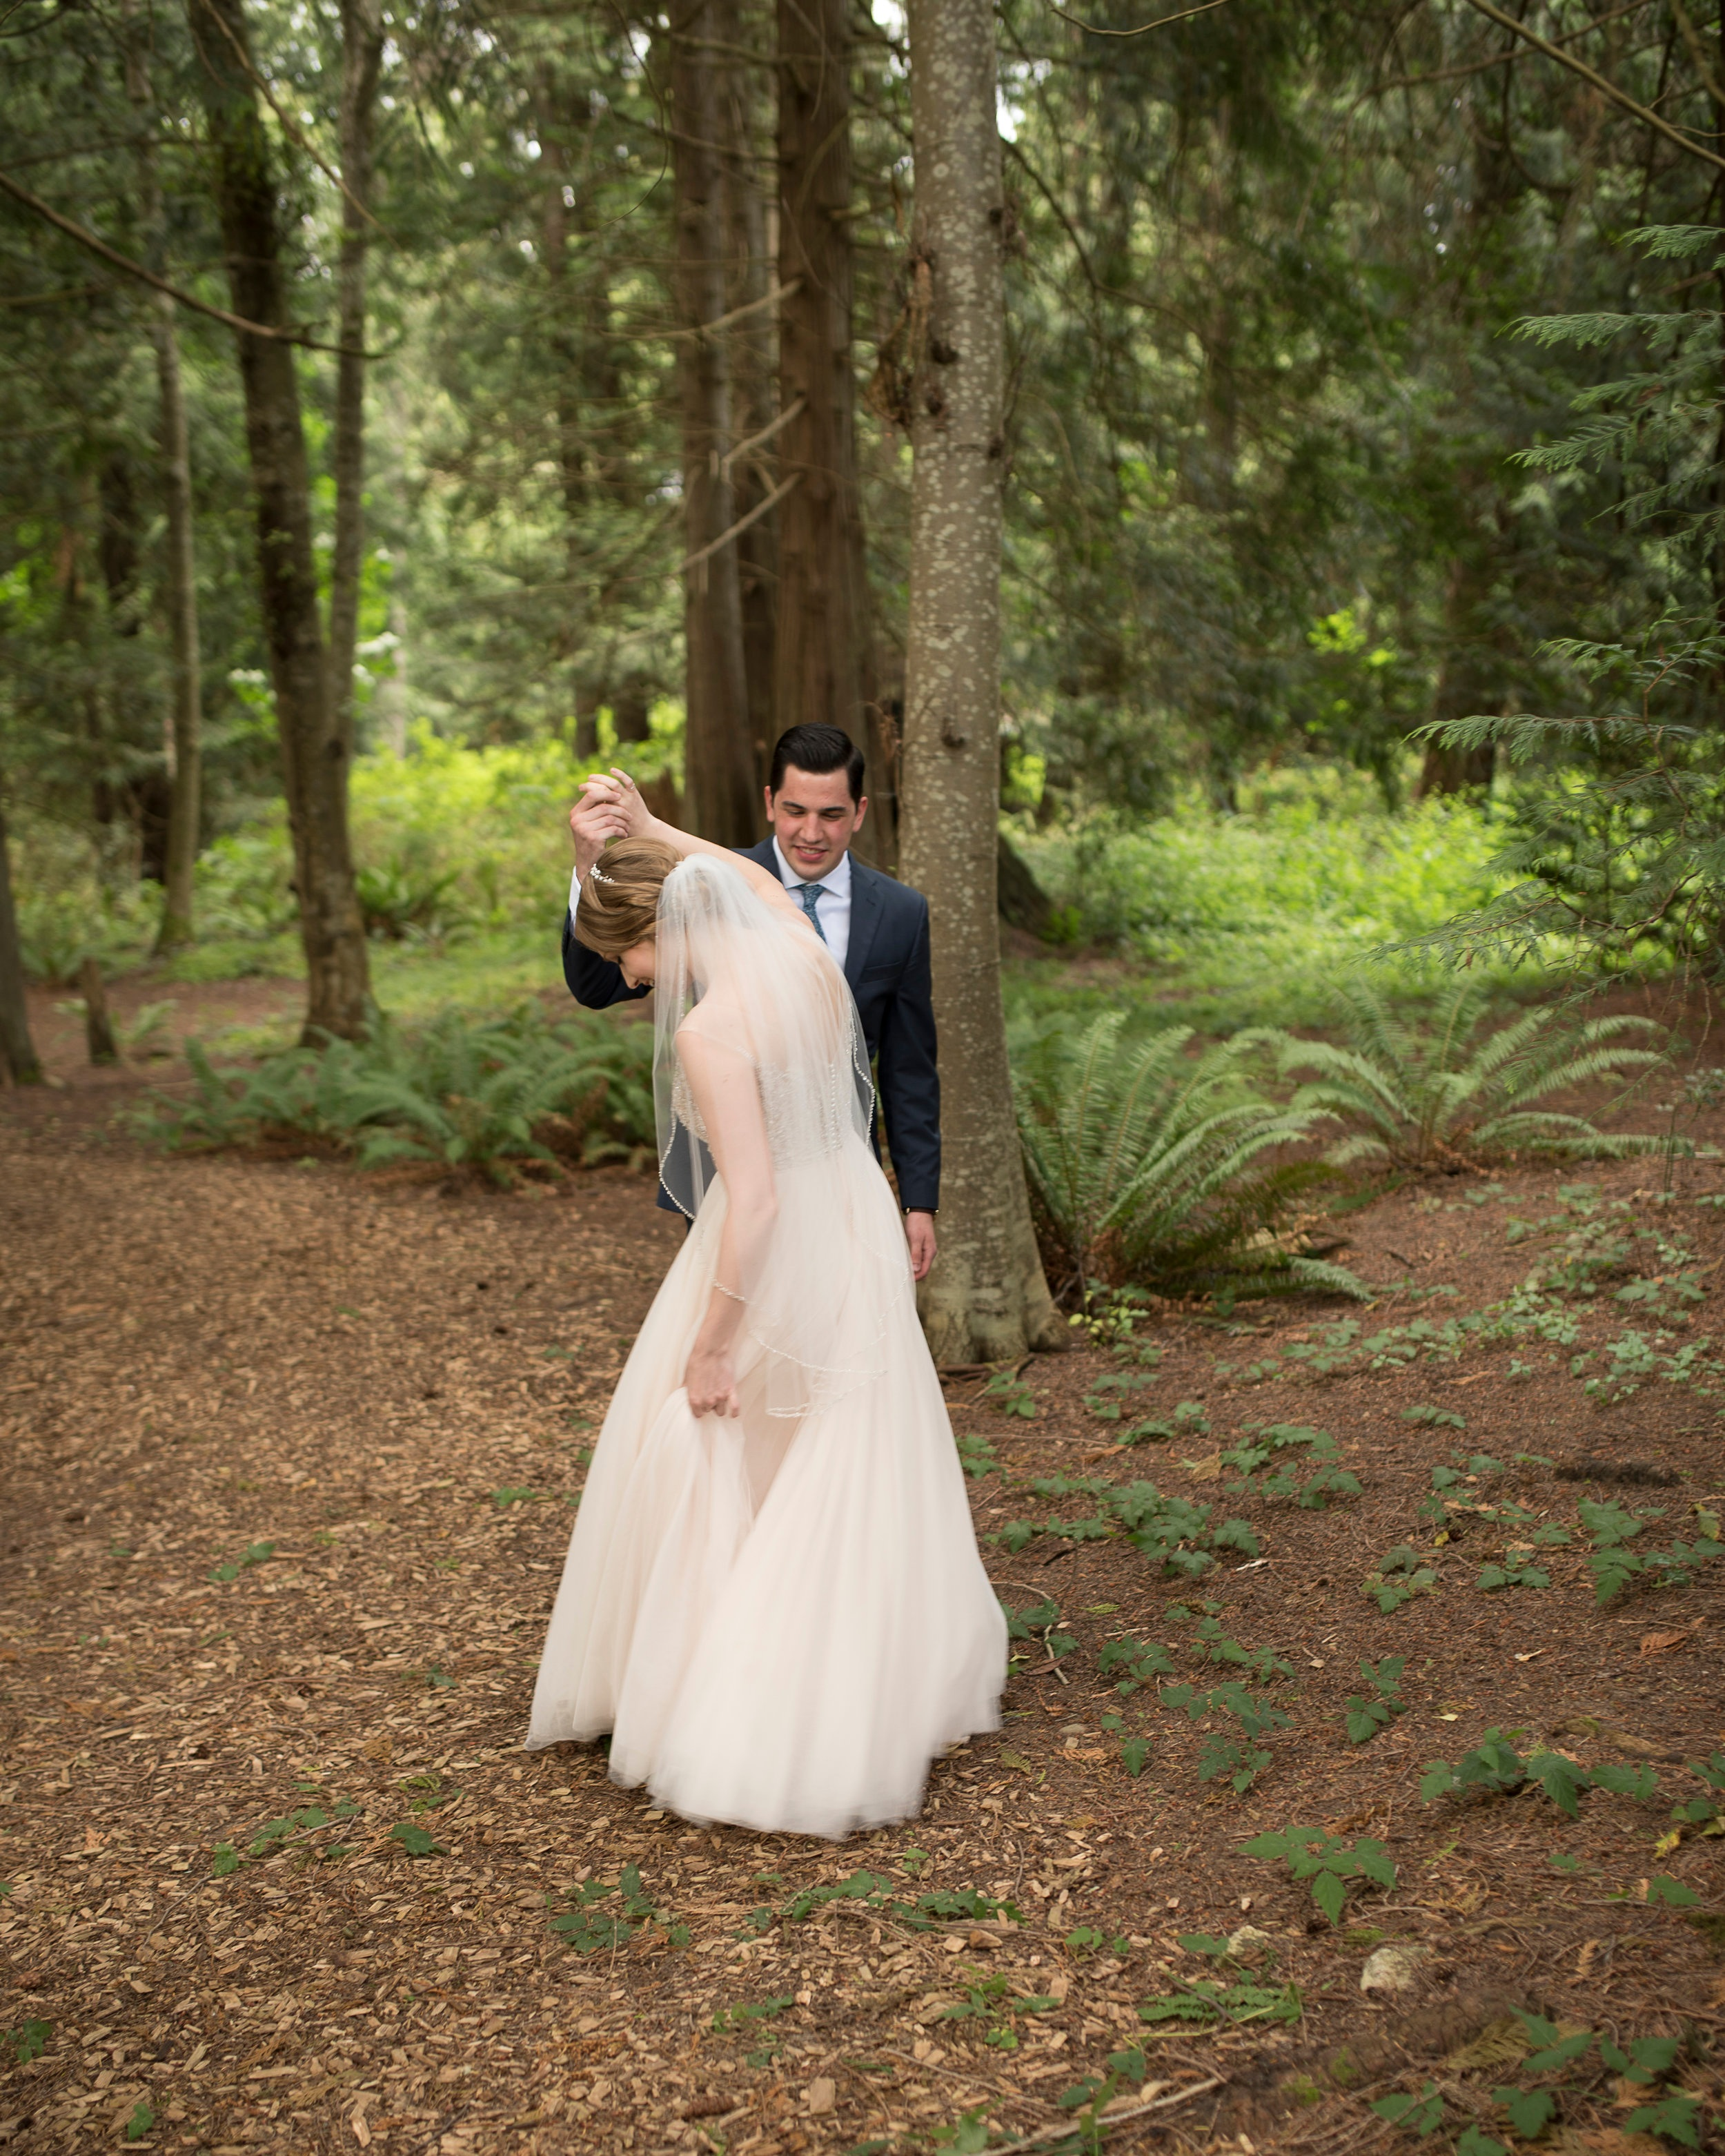 first look twirl wedding photo. Kristin Grover Images. Jacksonville, FL wedding photographer